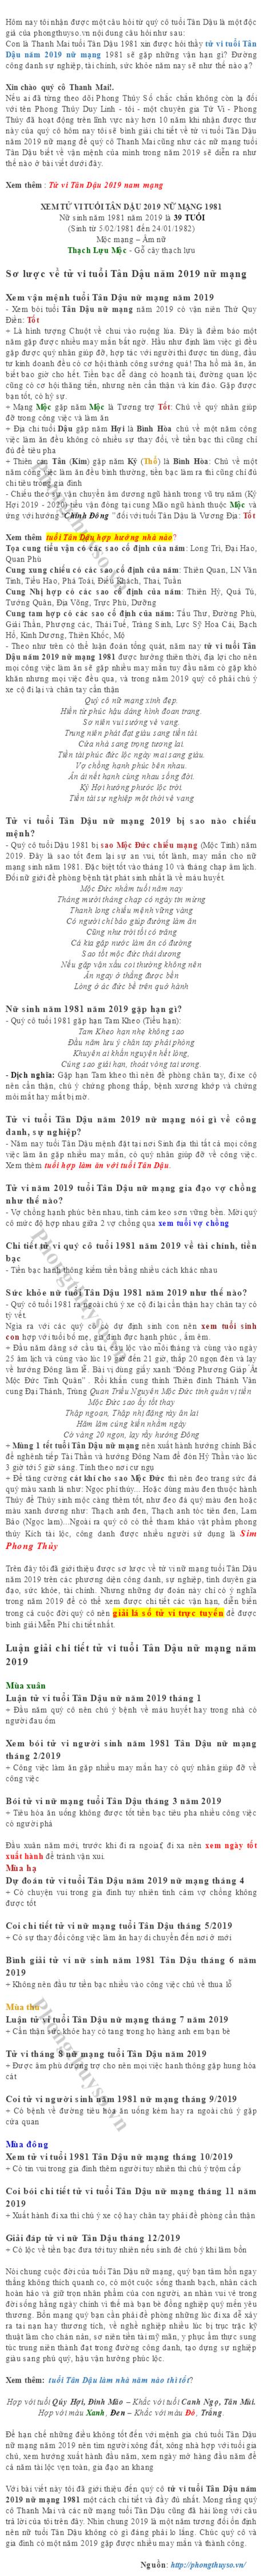 tu-vi-tuoi-tan-dau-nam-2019-nu-mang